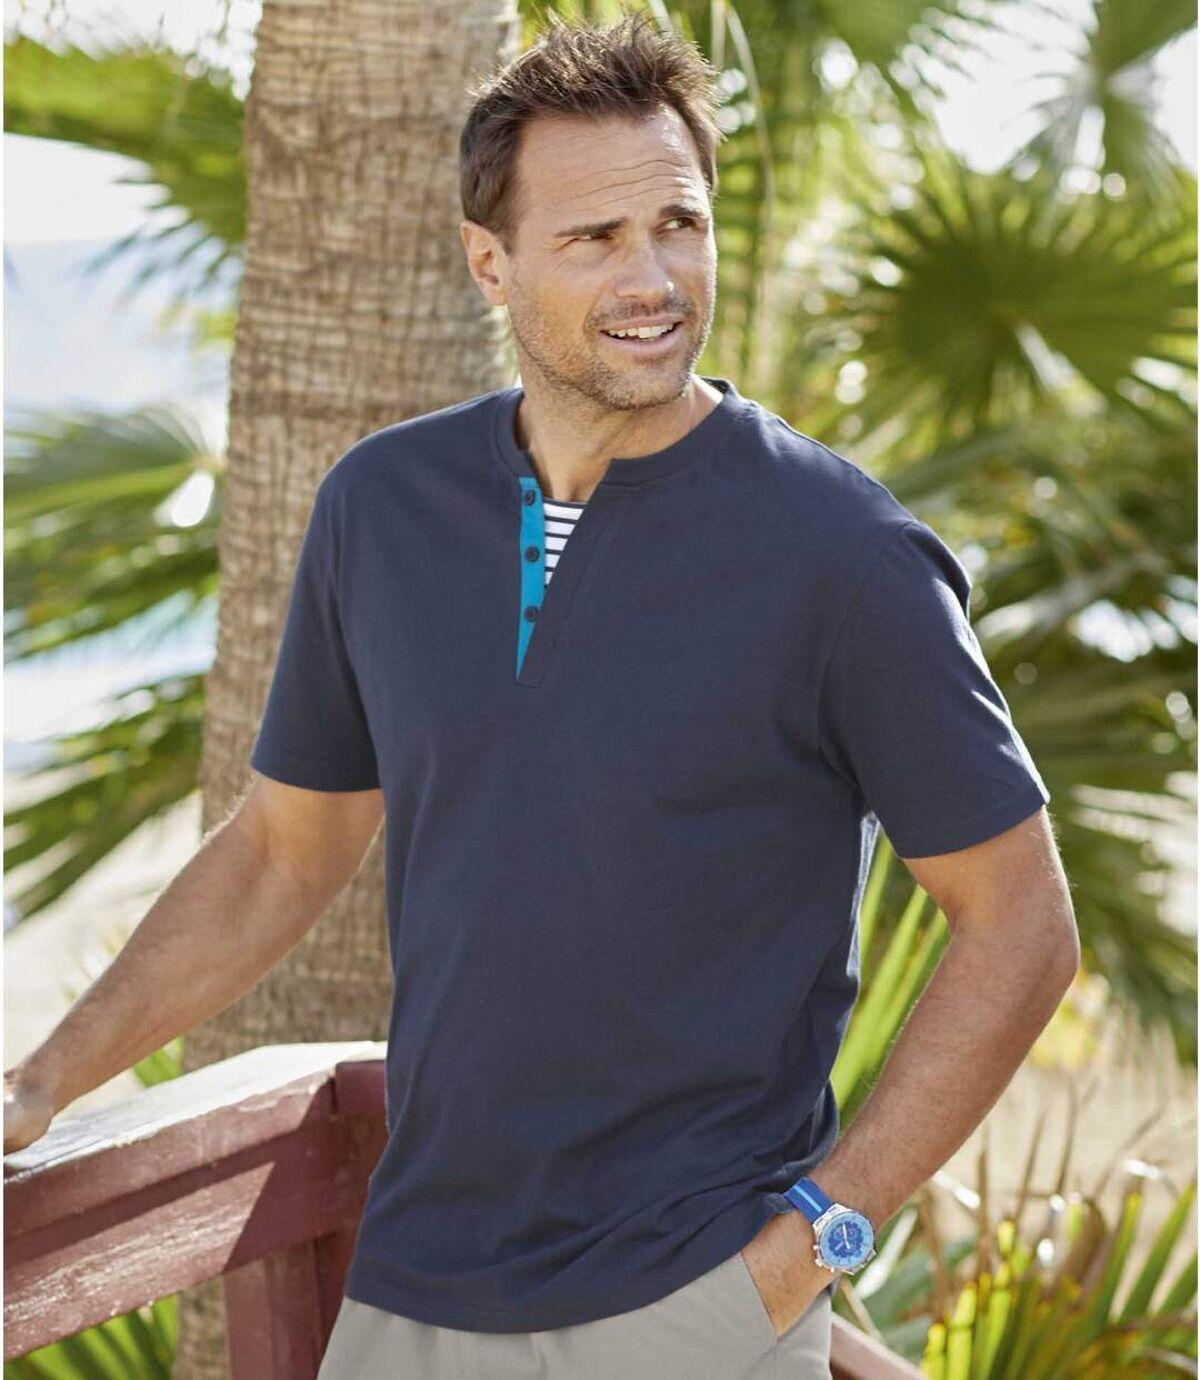 Pack of 2 Men's Sailing T-Shirts - Navy Blue Atlas For Men